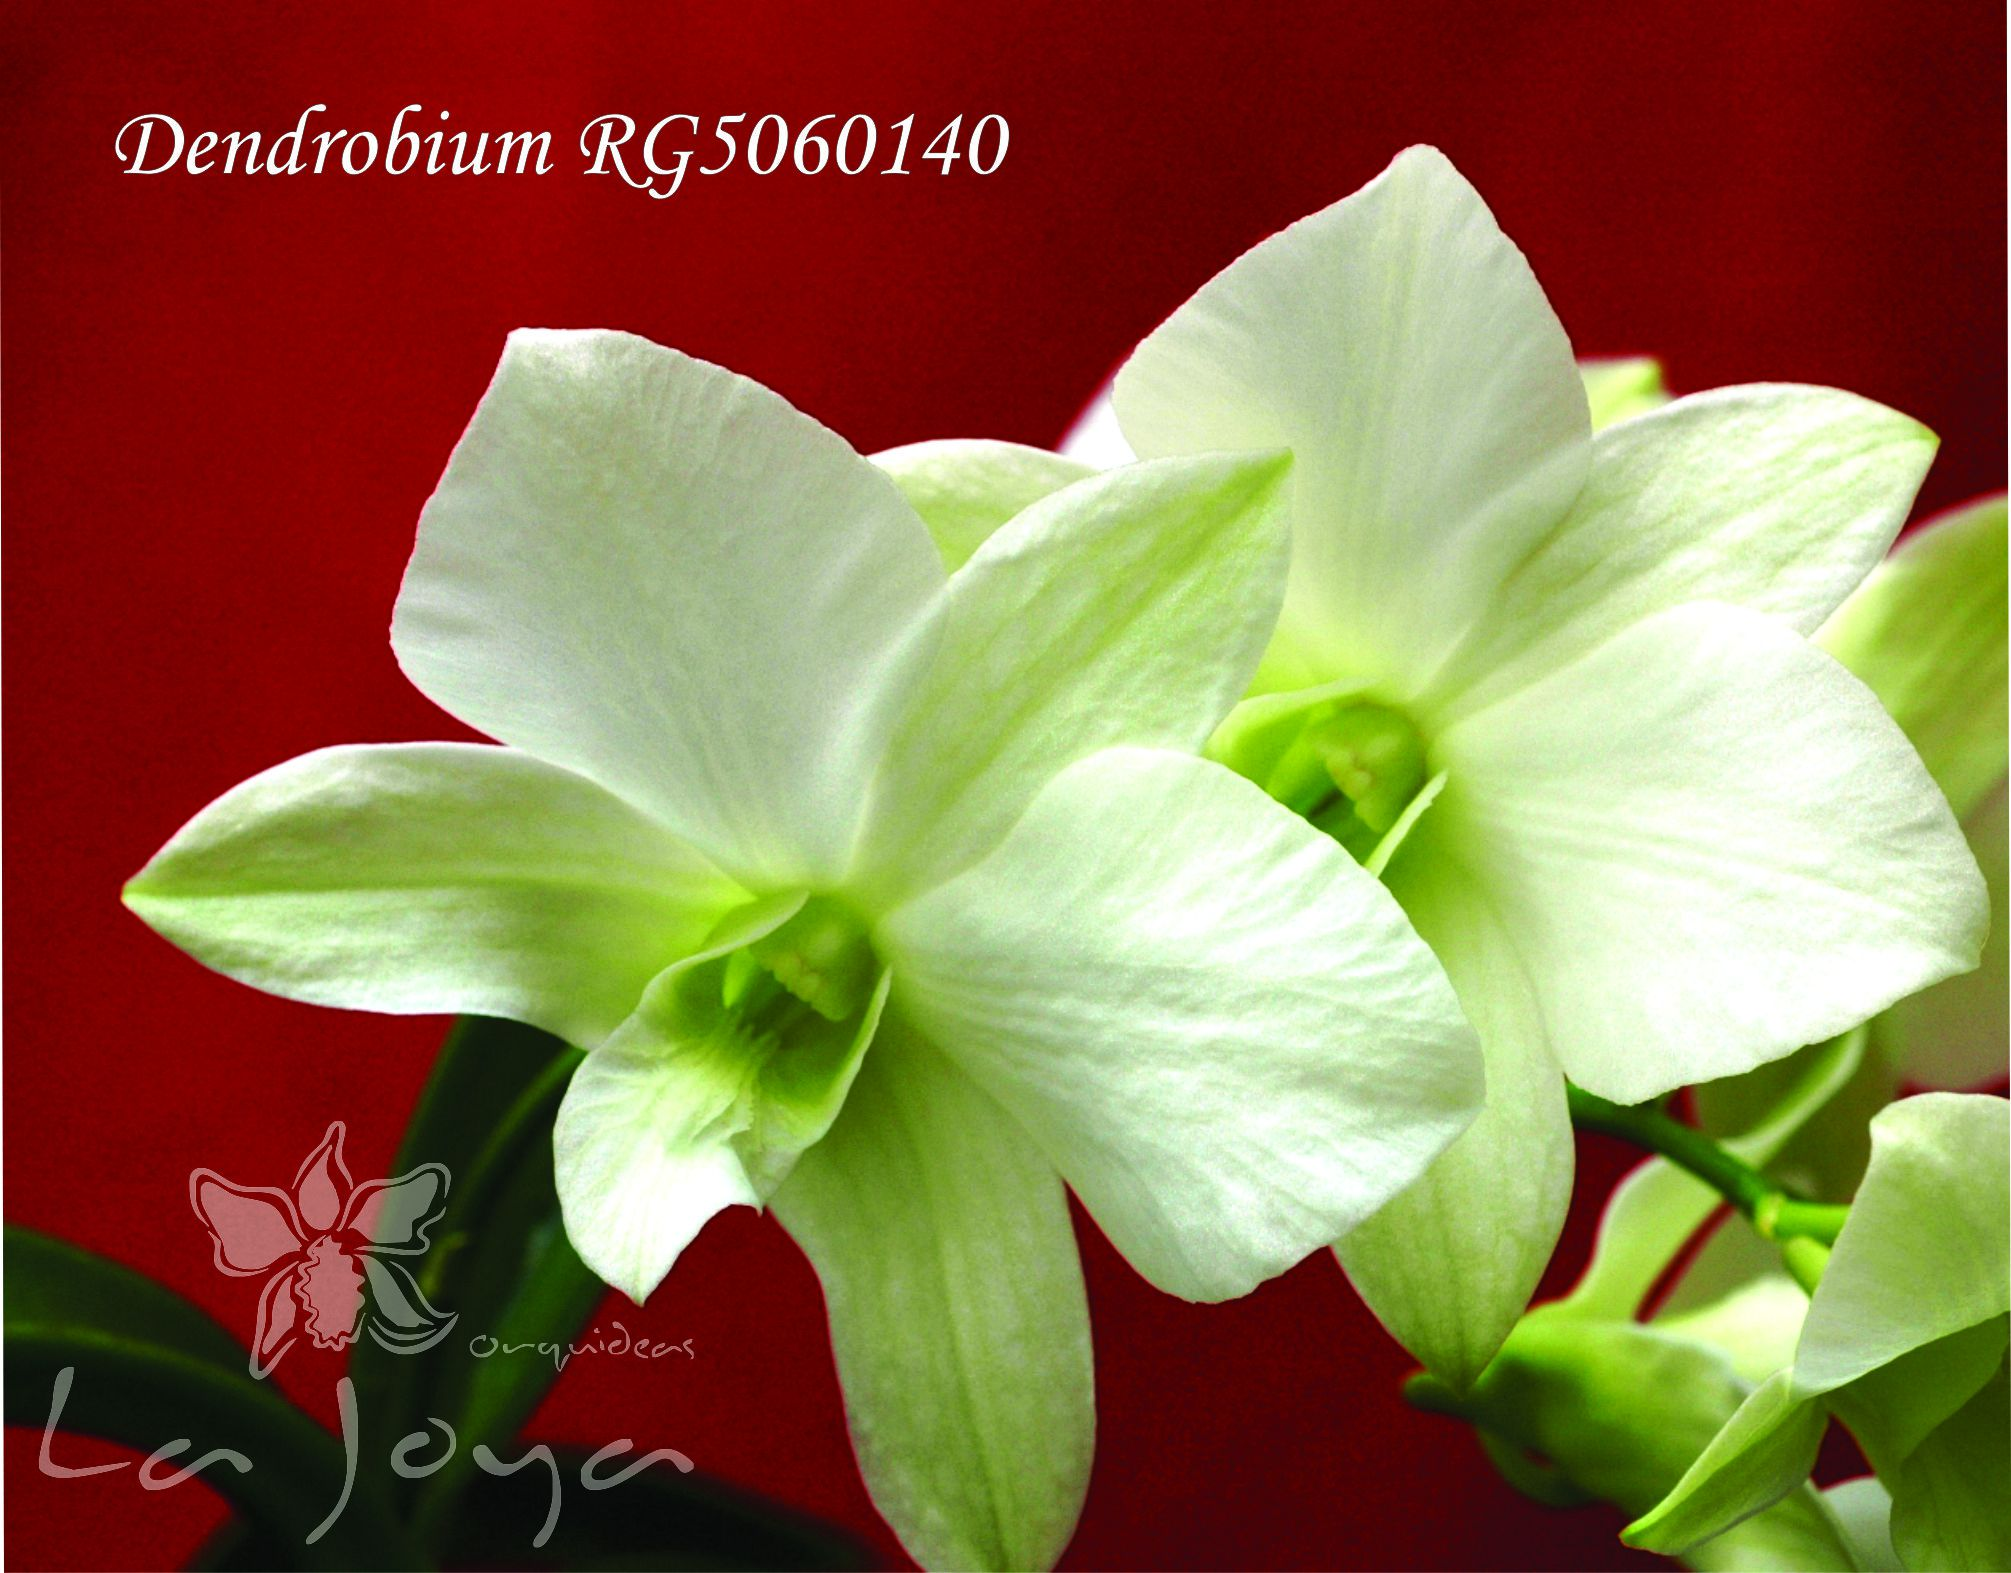 RG5060140